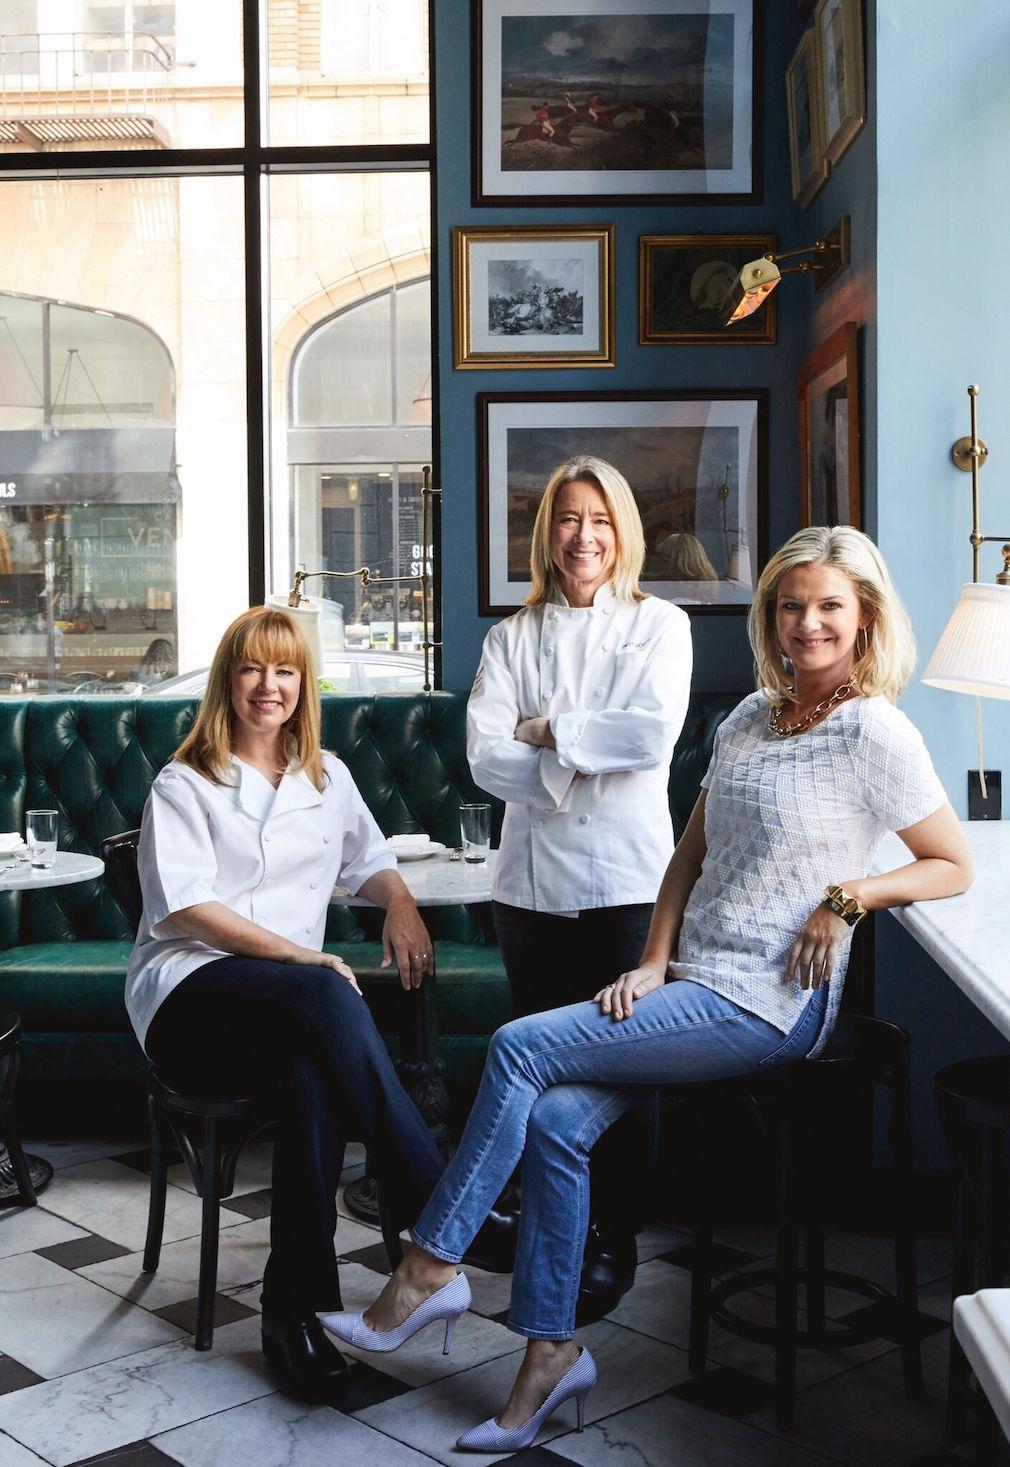 Jennifer Puccio, Emily Luchetti, and Anna Weinberg